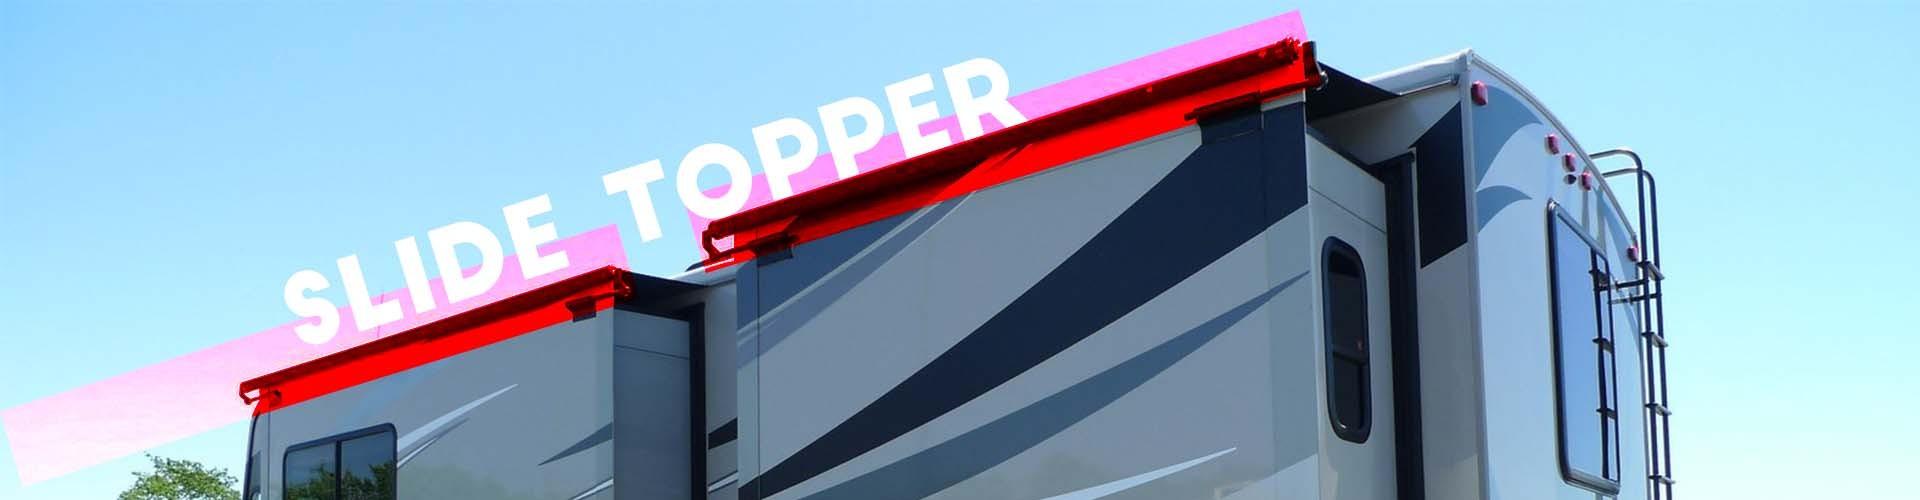 slide topper for protection